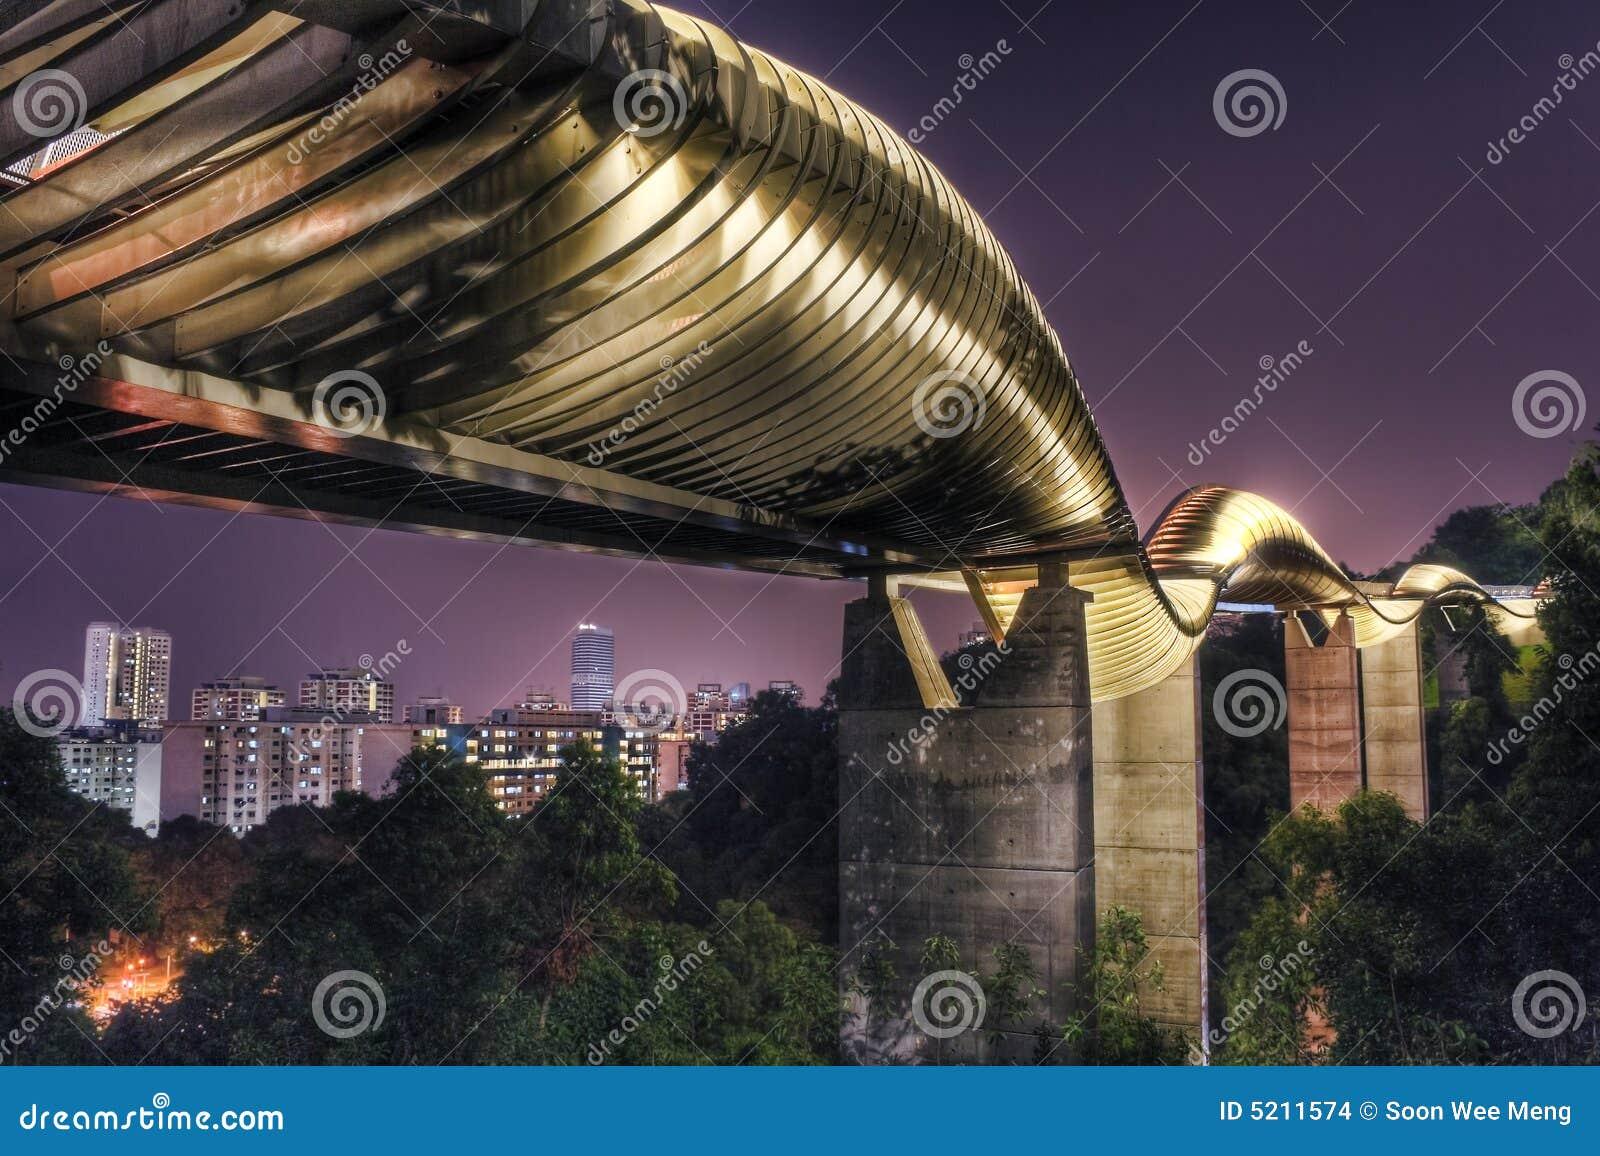 Bridge in Singapore : Henderson Waves